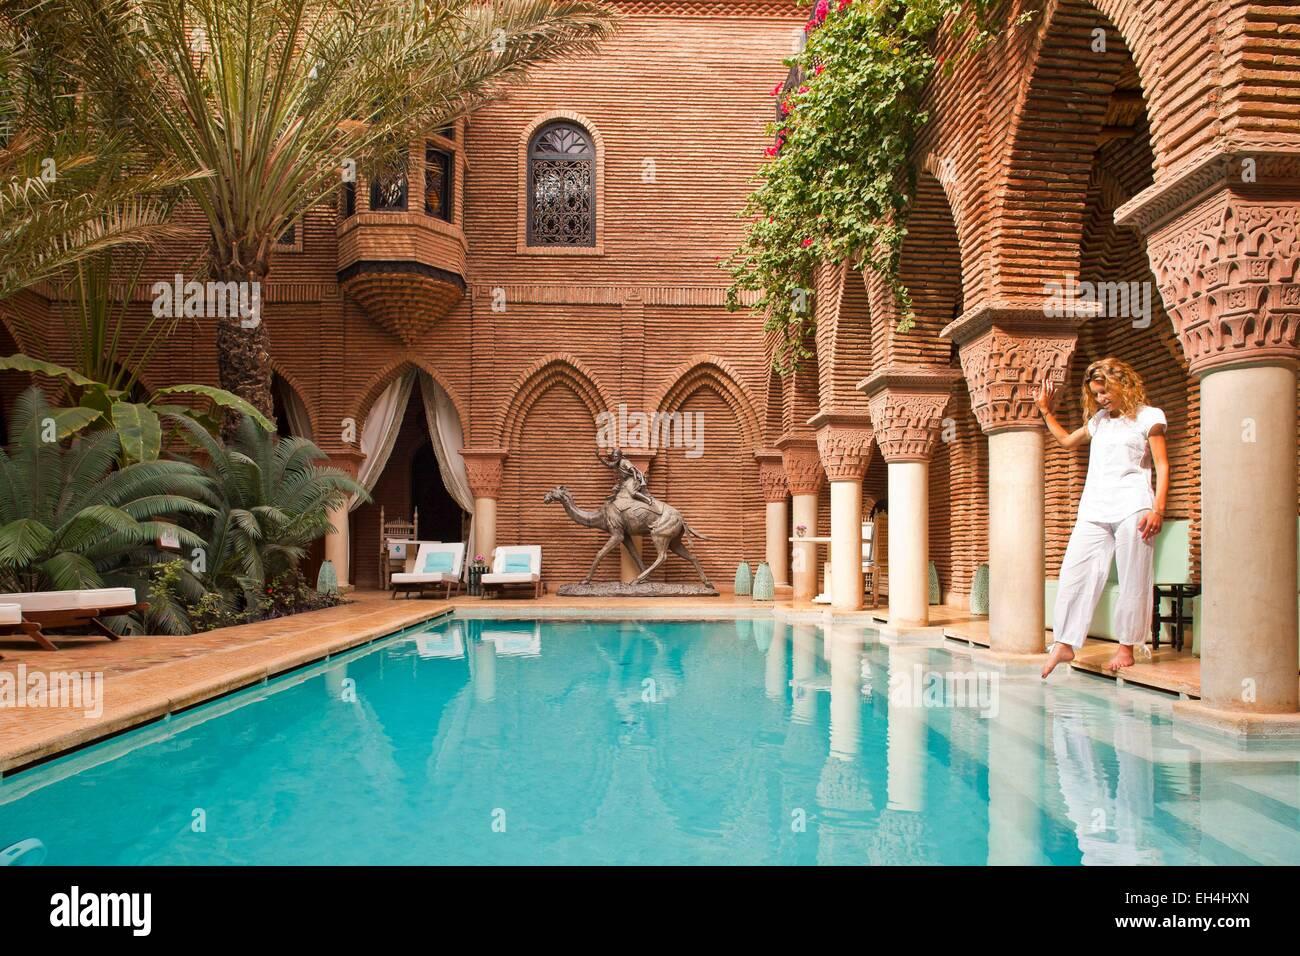 Morocco high atlas marrakech imperial city luxury hotel la sultana 5 stars woman in the pool